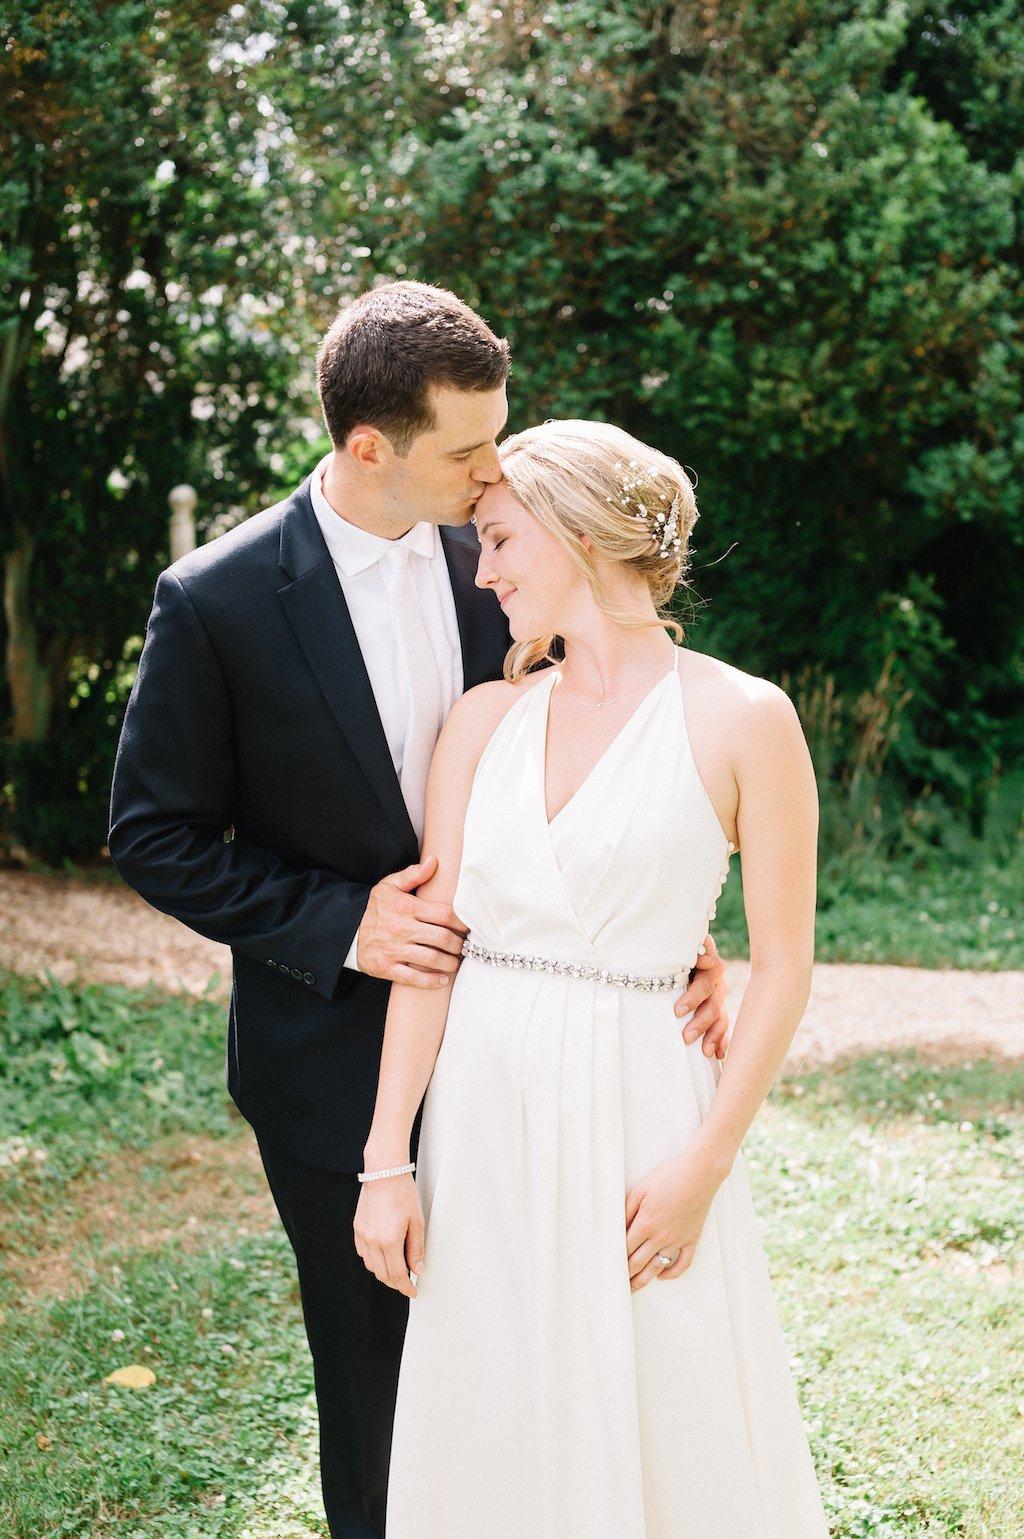 4-5-16-rixey-manor-green-wedding-rustic-9